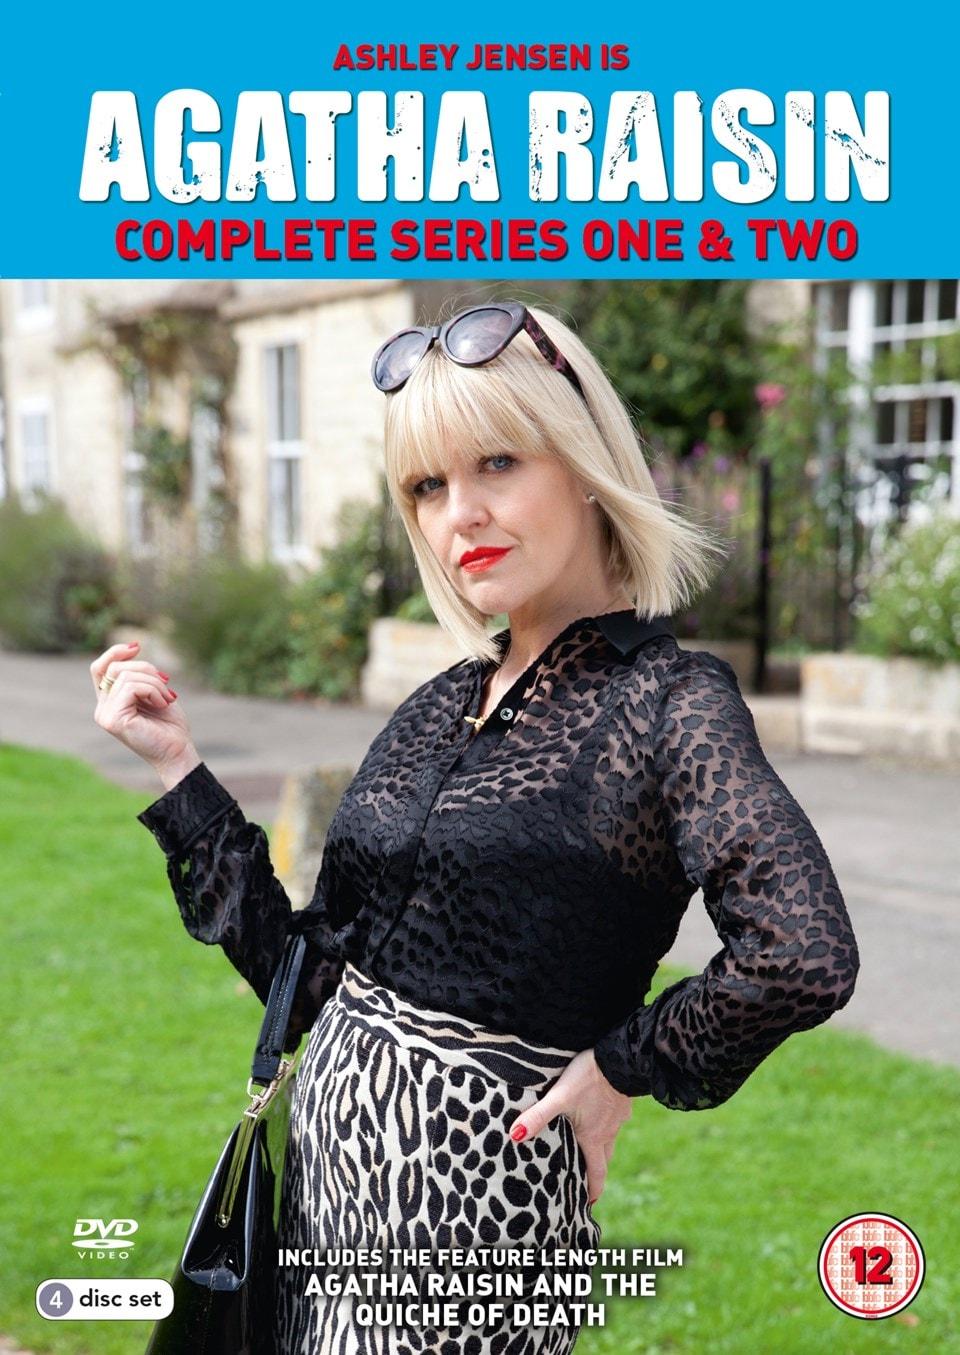 Agatha Raisin: Complete Series One & Two - 1